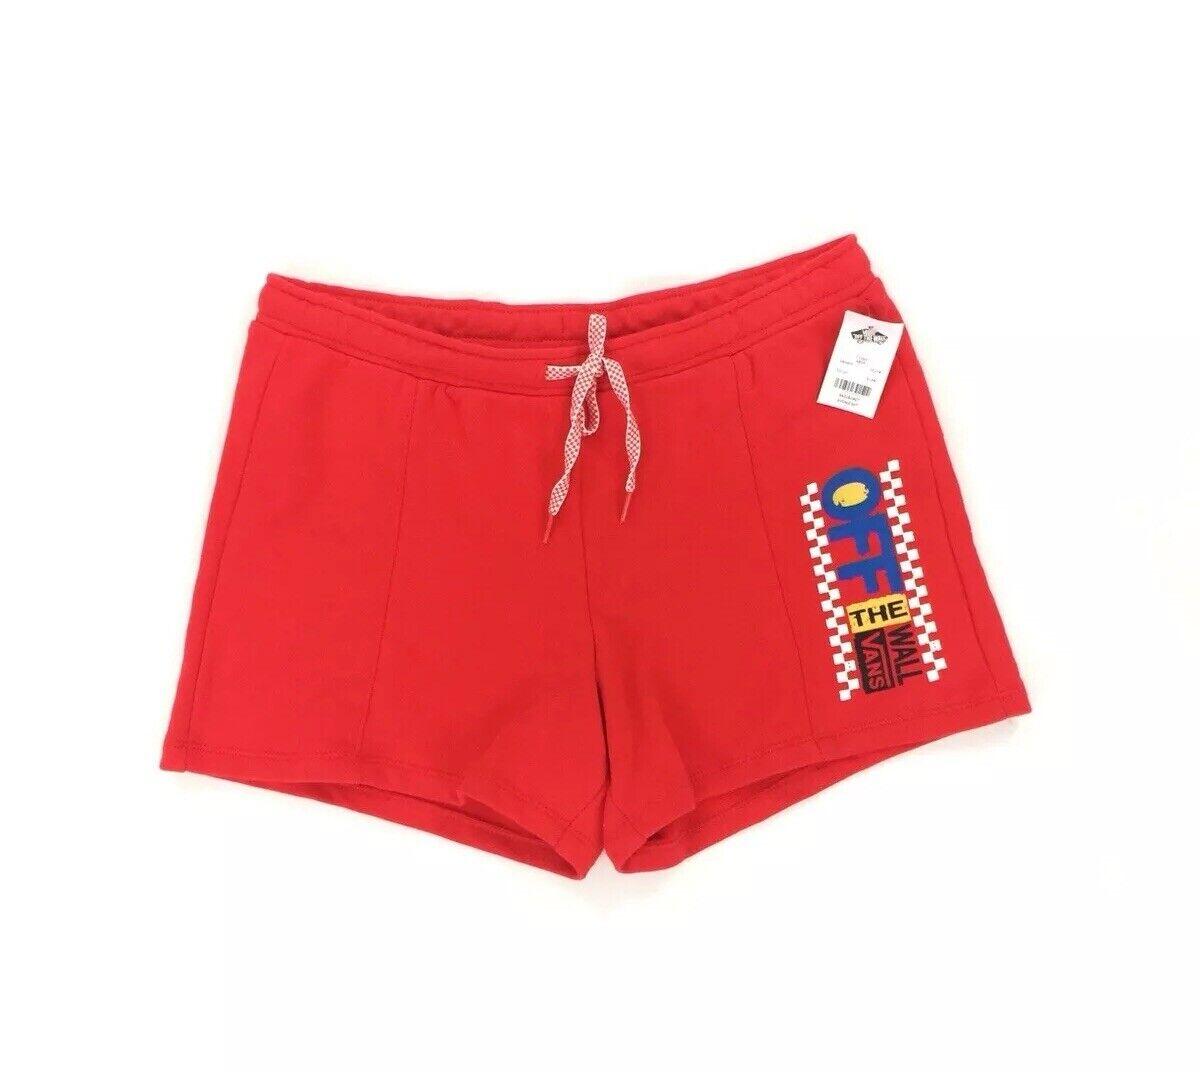 Vans Women's Shorts & Skorts Sears